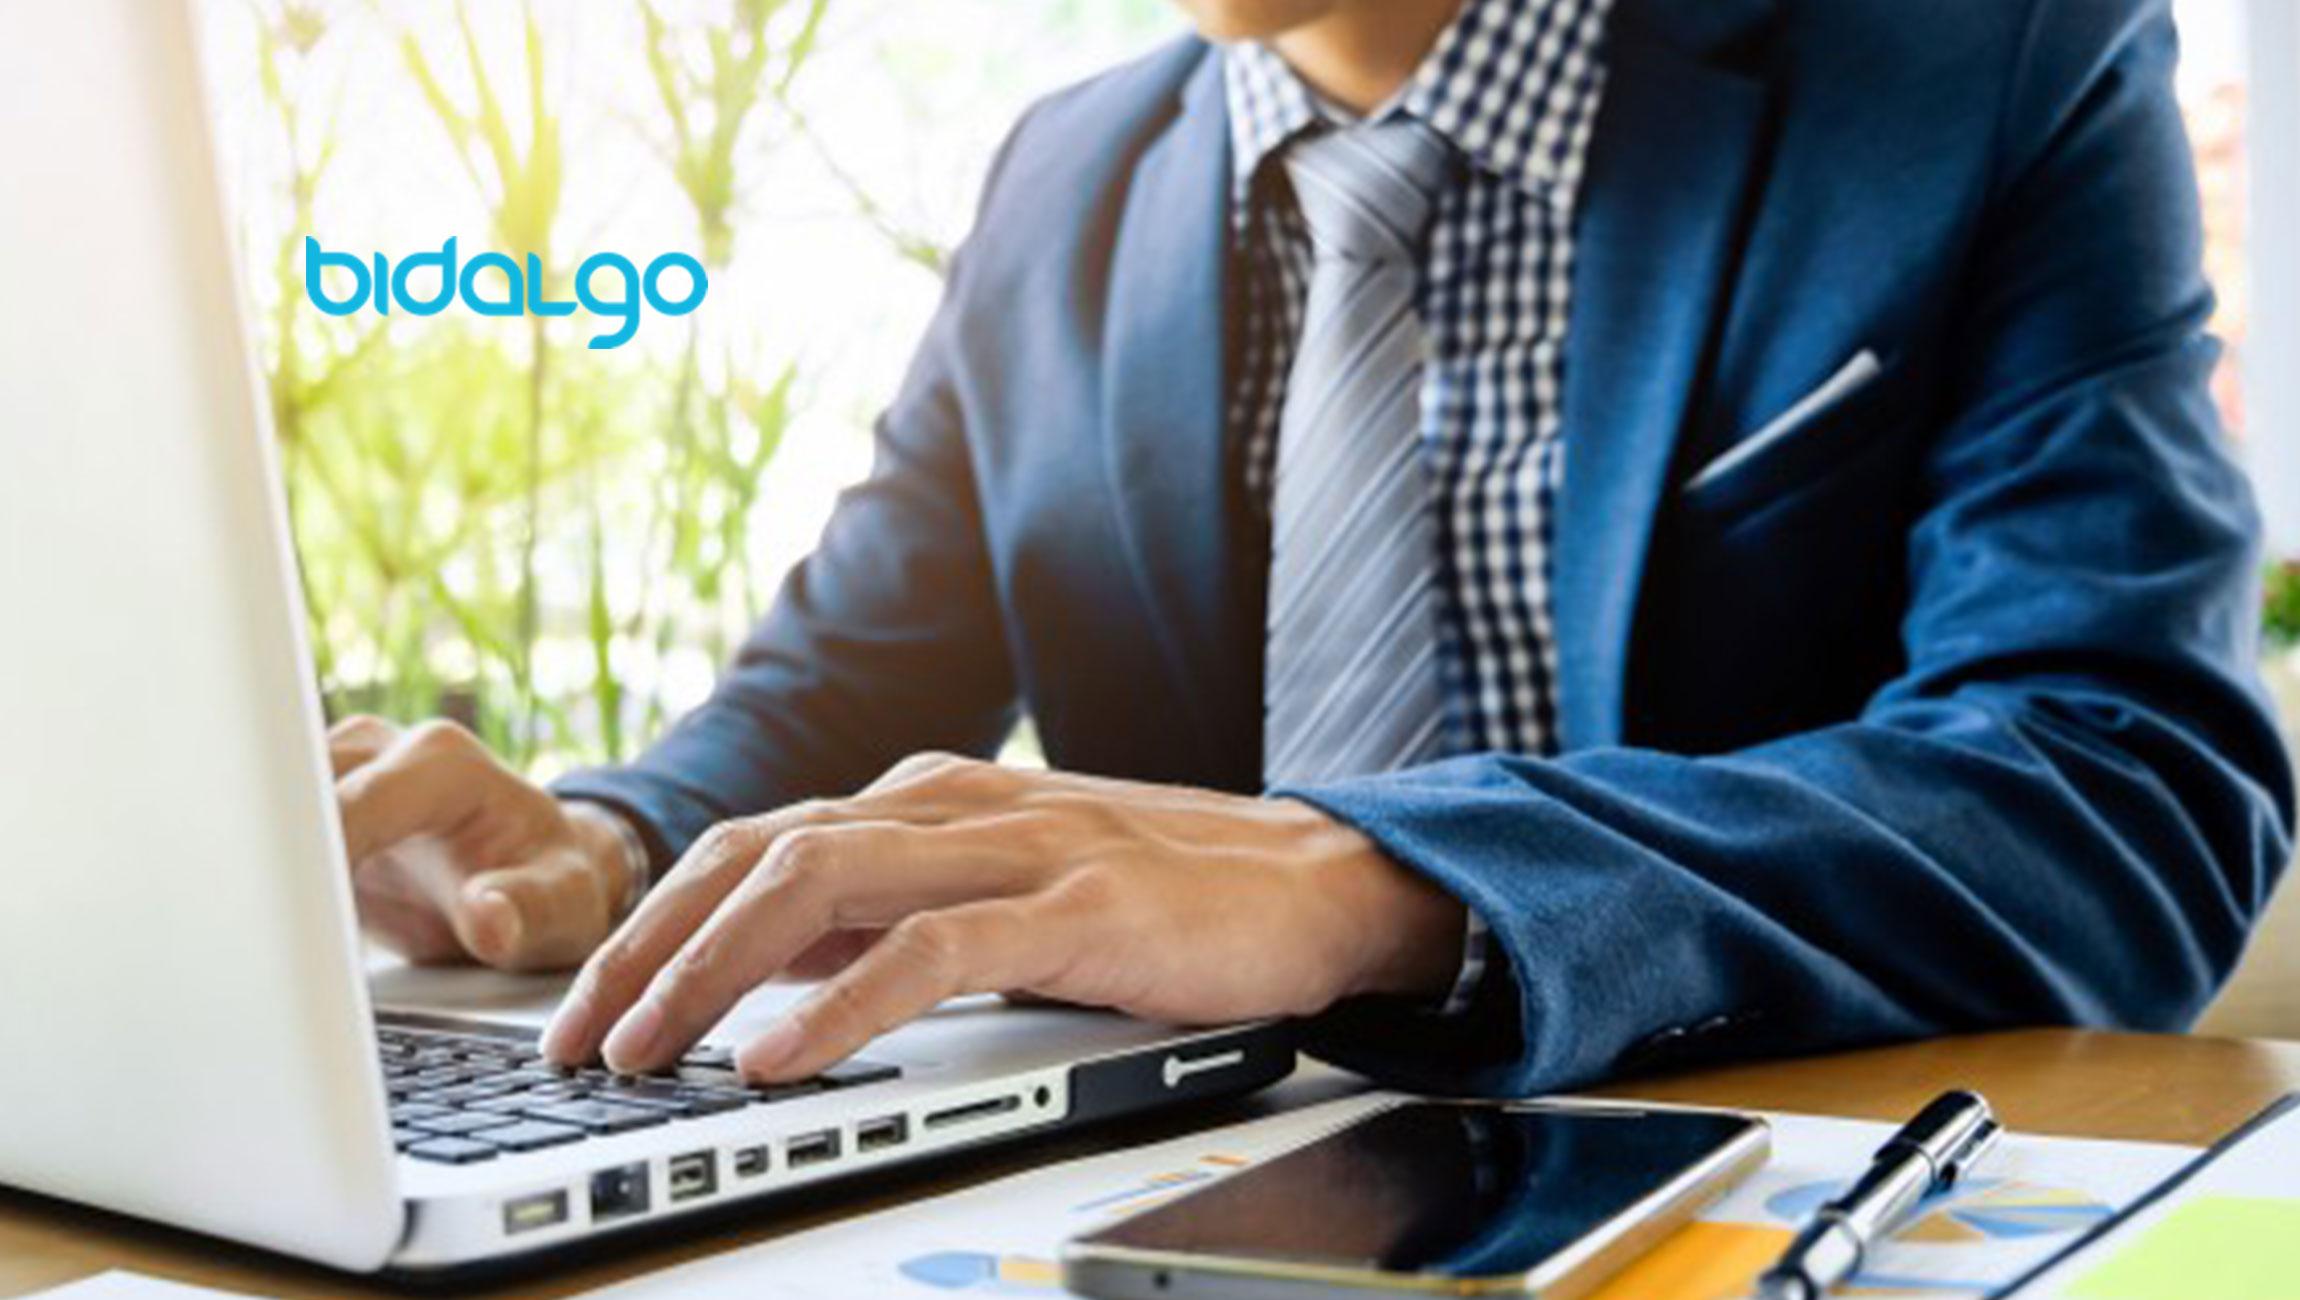 Bidalgo Brings Artificial Intelligence to Digital Ad Creative With Creative AI